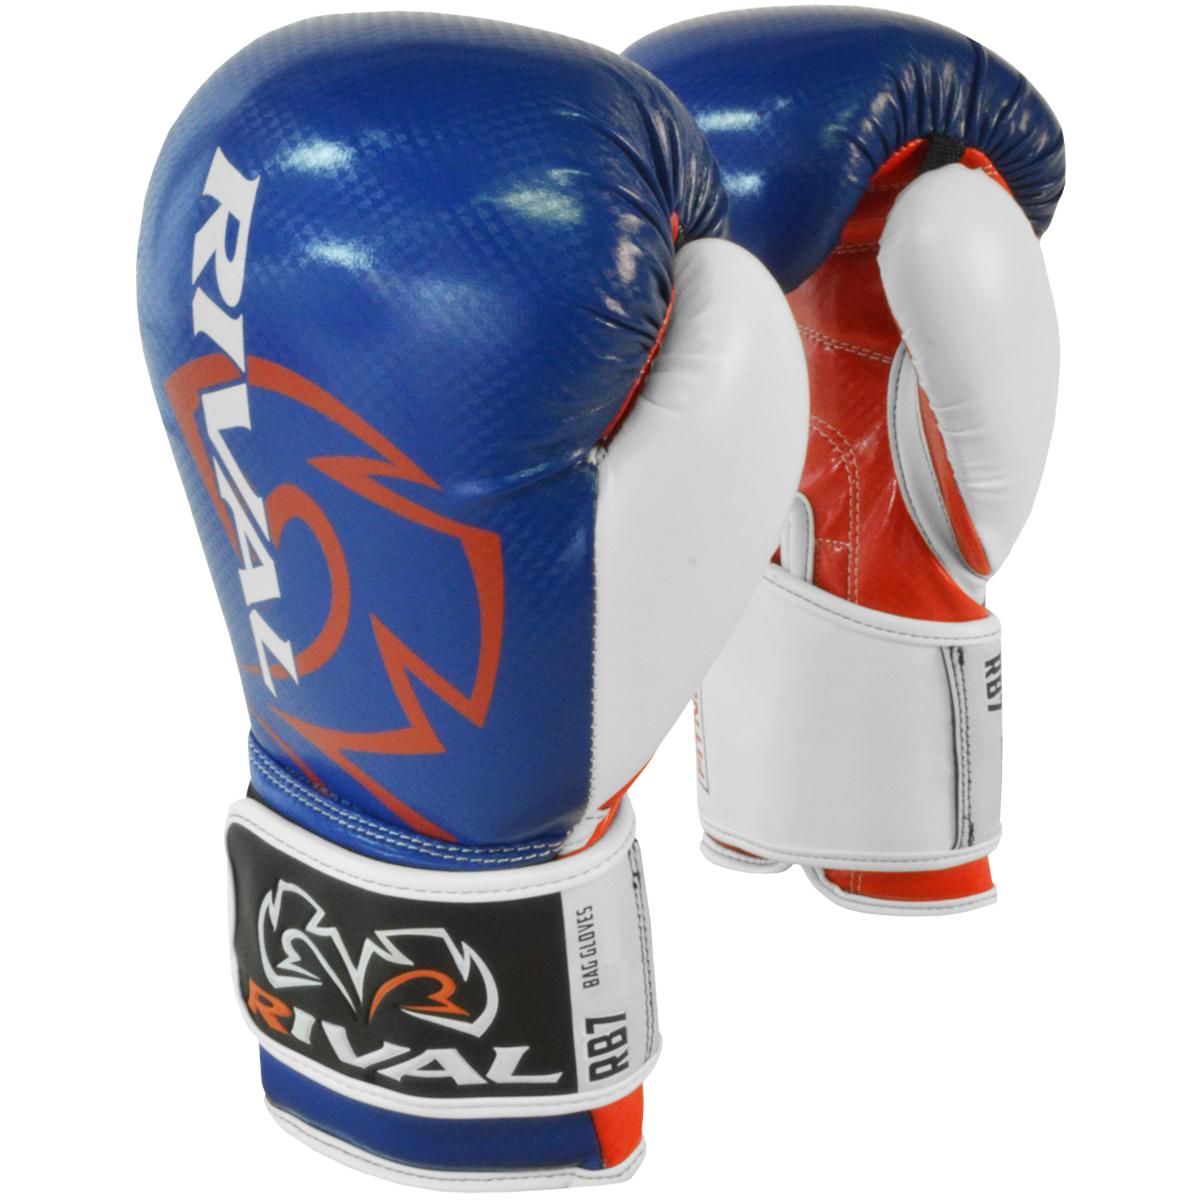 Rival Boxing Gloves White